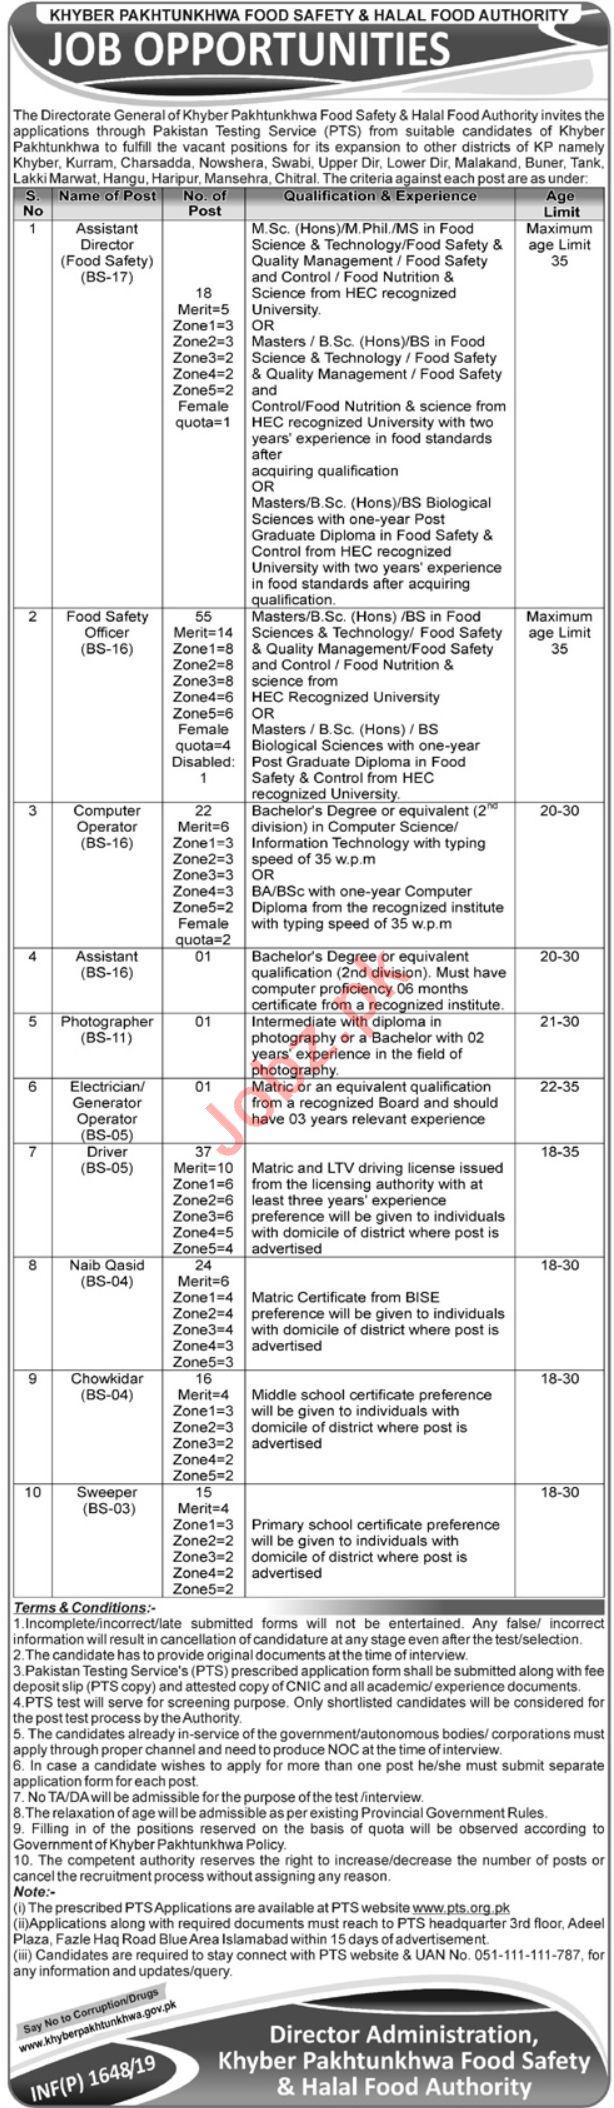 KP Food Safety & Halal Food Authority Jobs 2019 via PTS